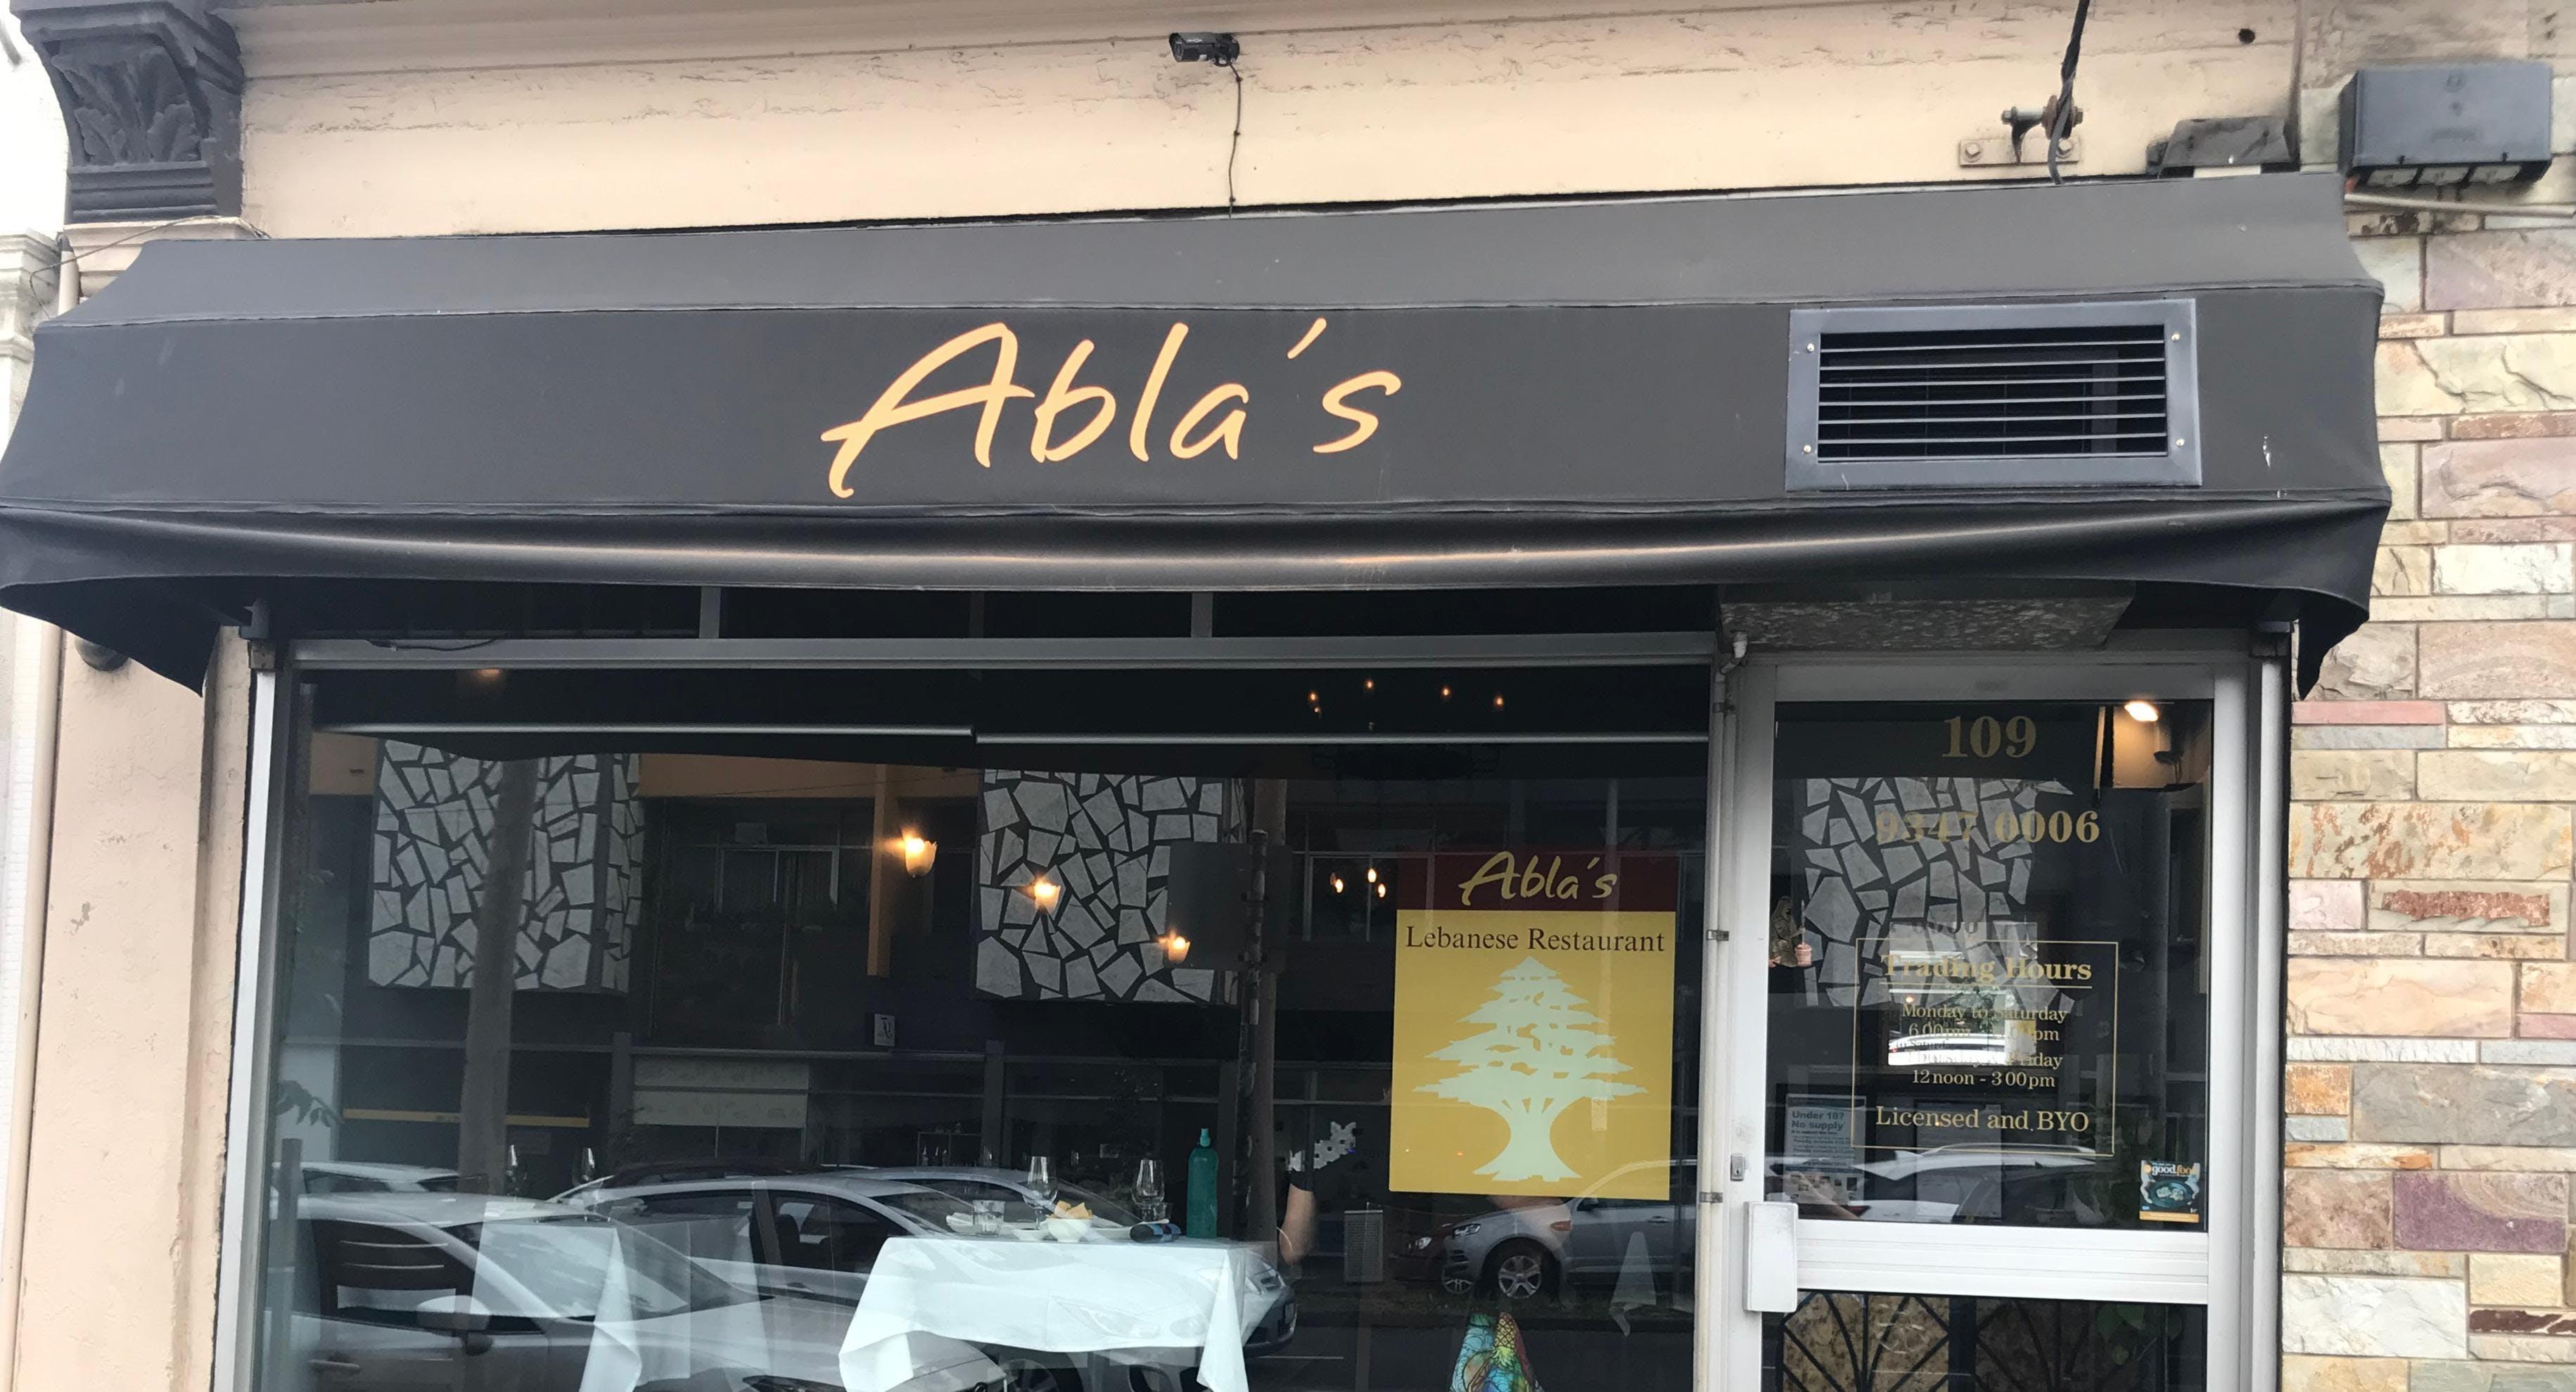 Abla's